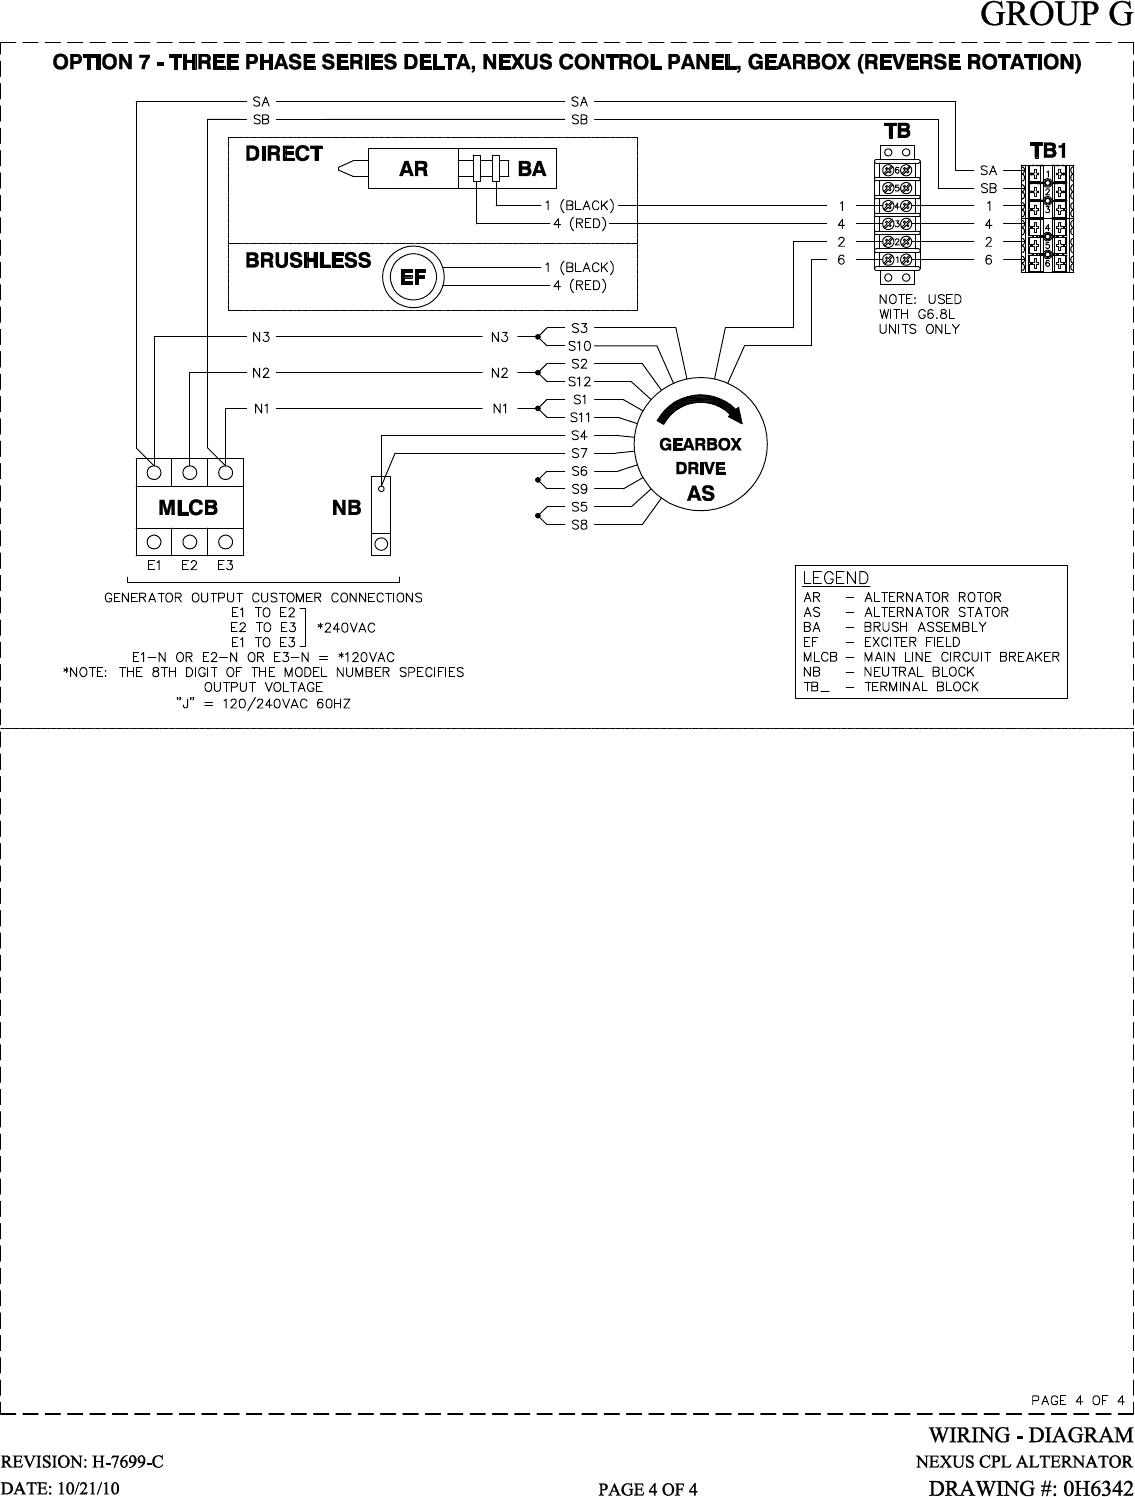 hight resolution of backpg001 rev a 04 07